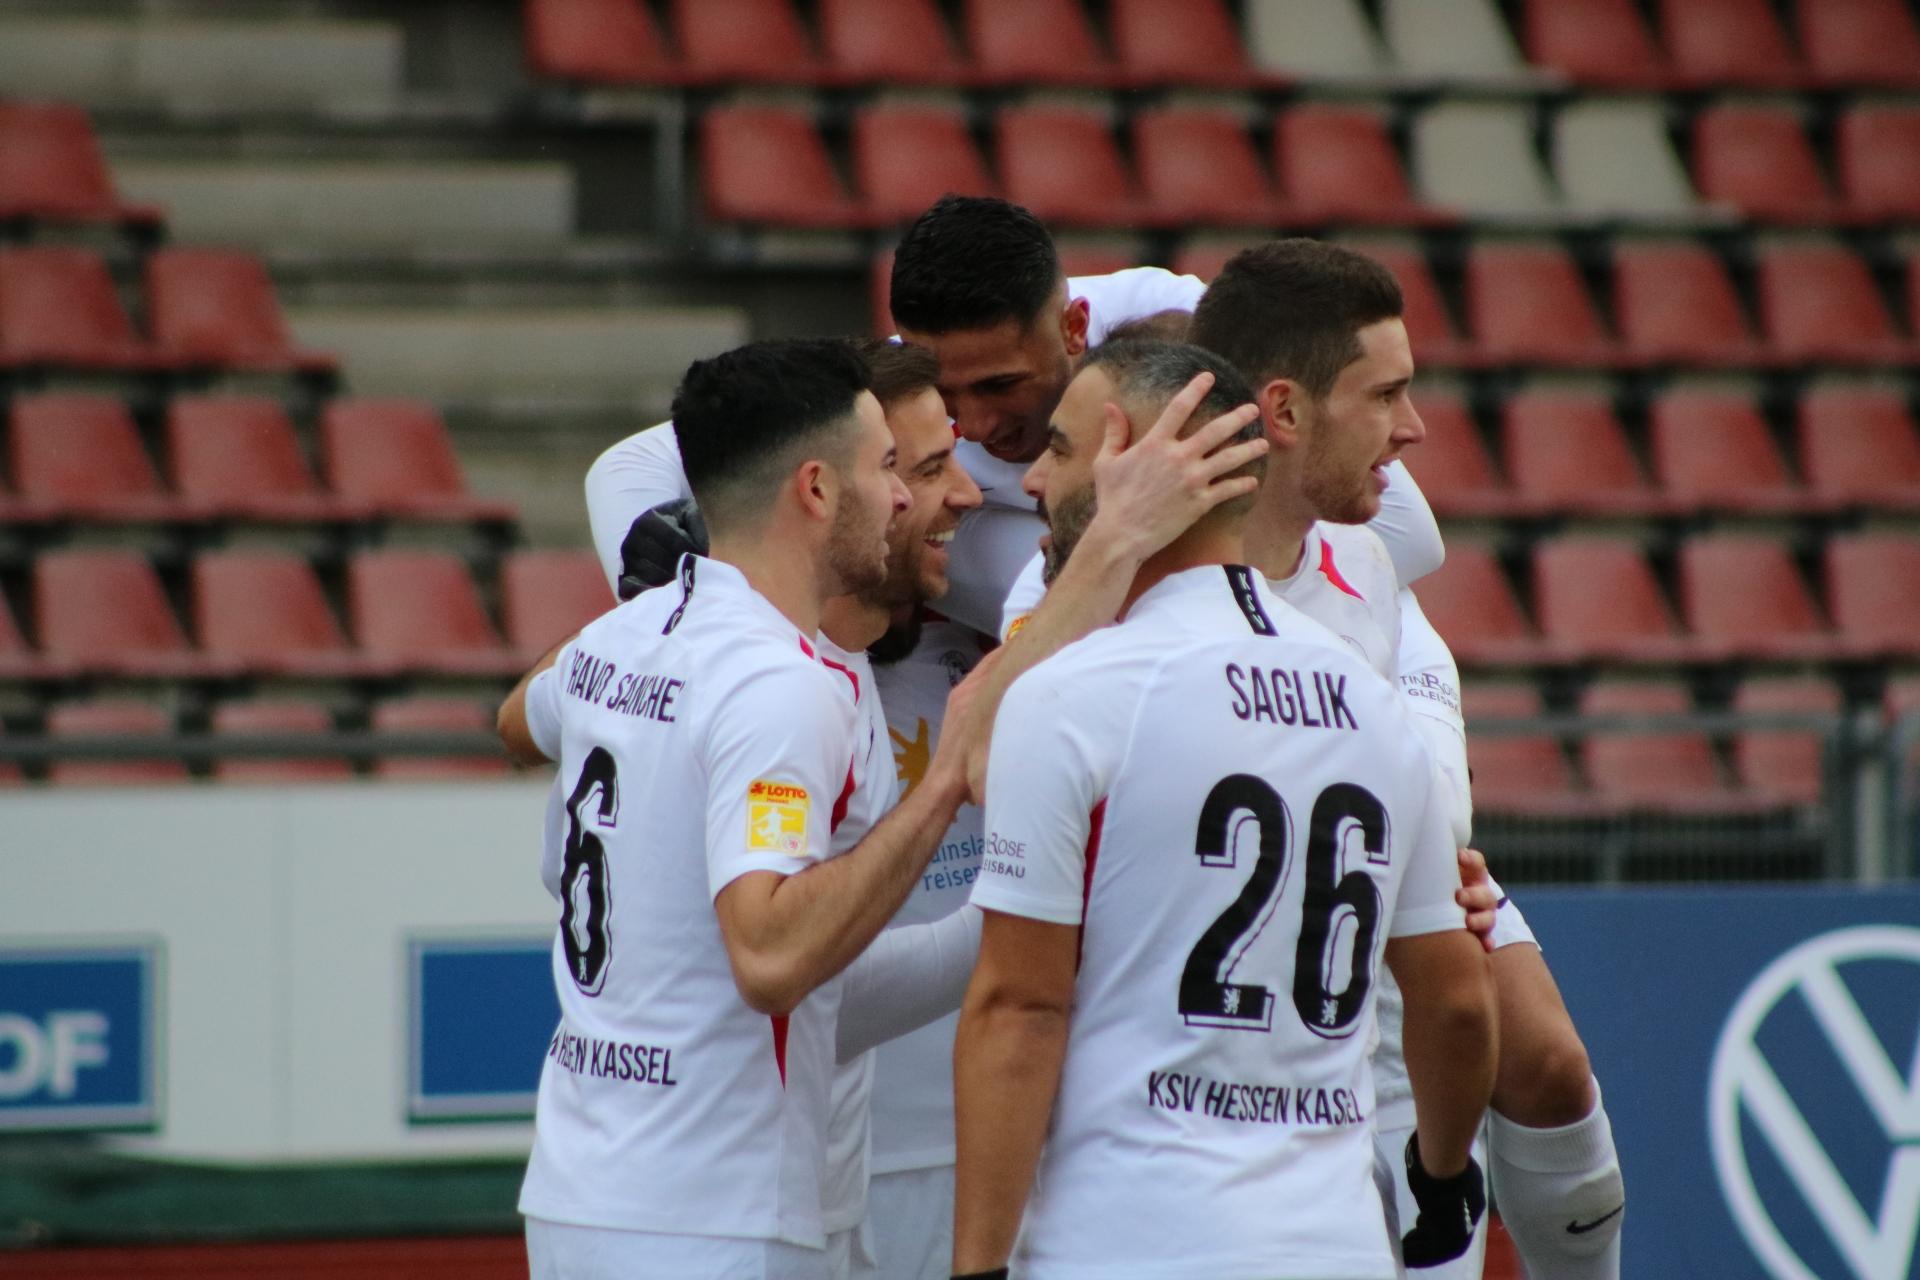 Lotto Hessenliga 2019/2020, KSV Hessen Kassel, FV Bad Vilbel, Endstand 6:1, Jubel zum 2:0 (KSV Hessen Kassel)